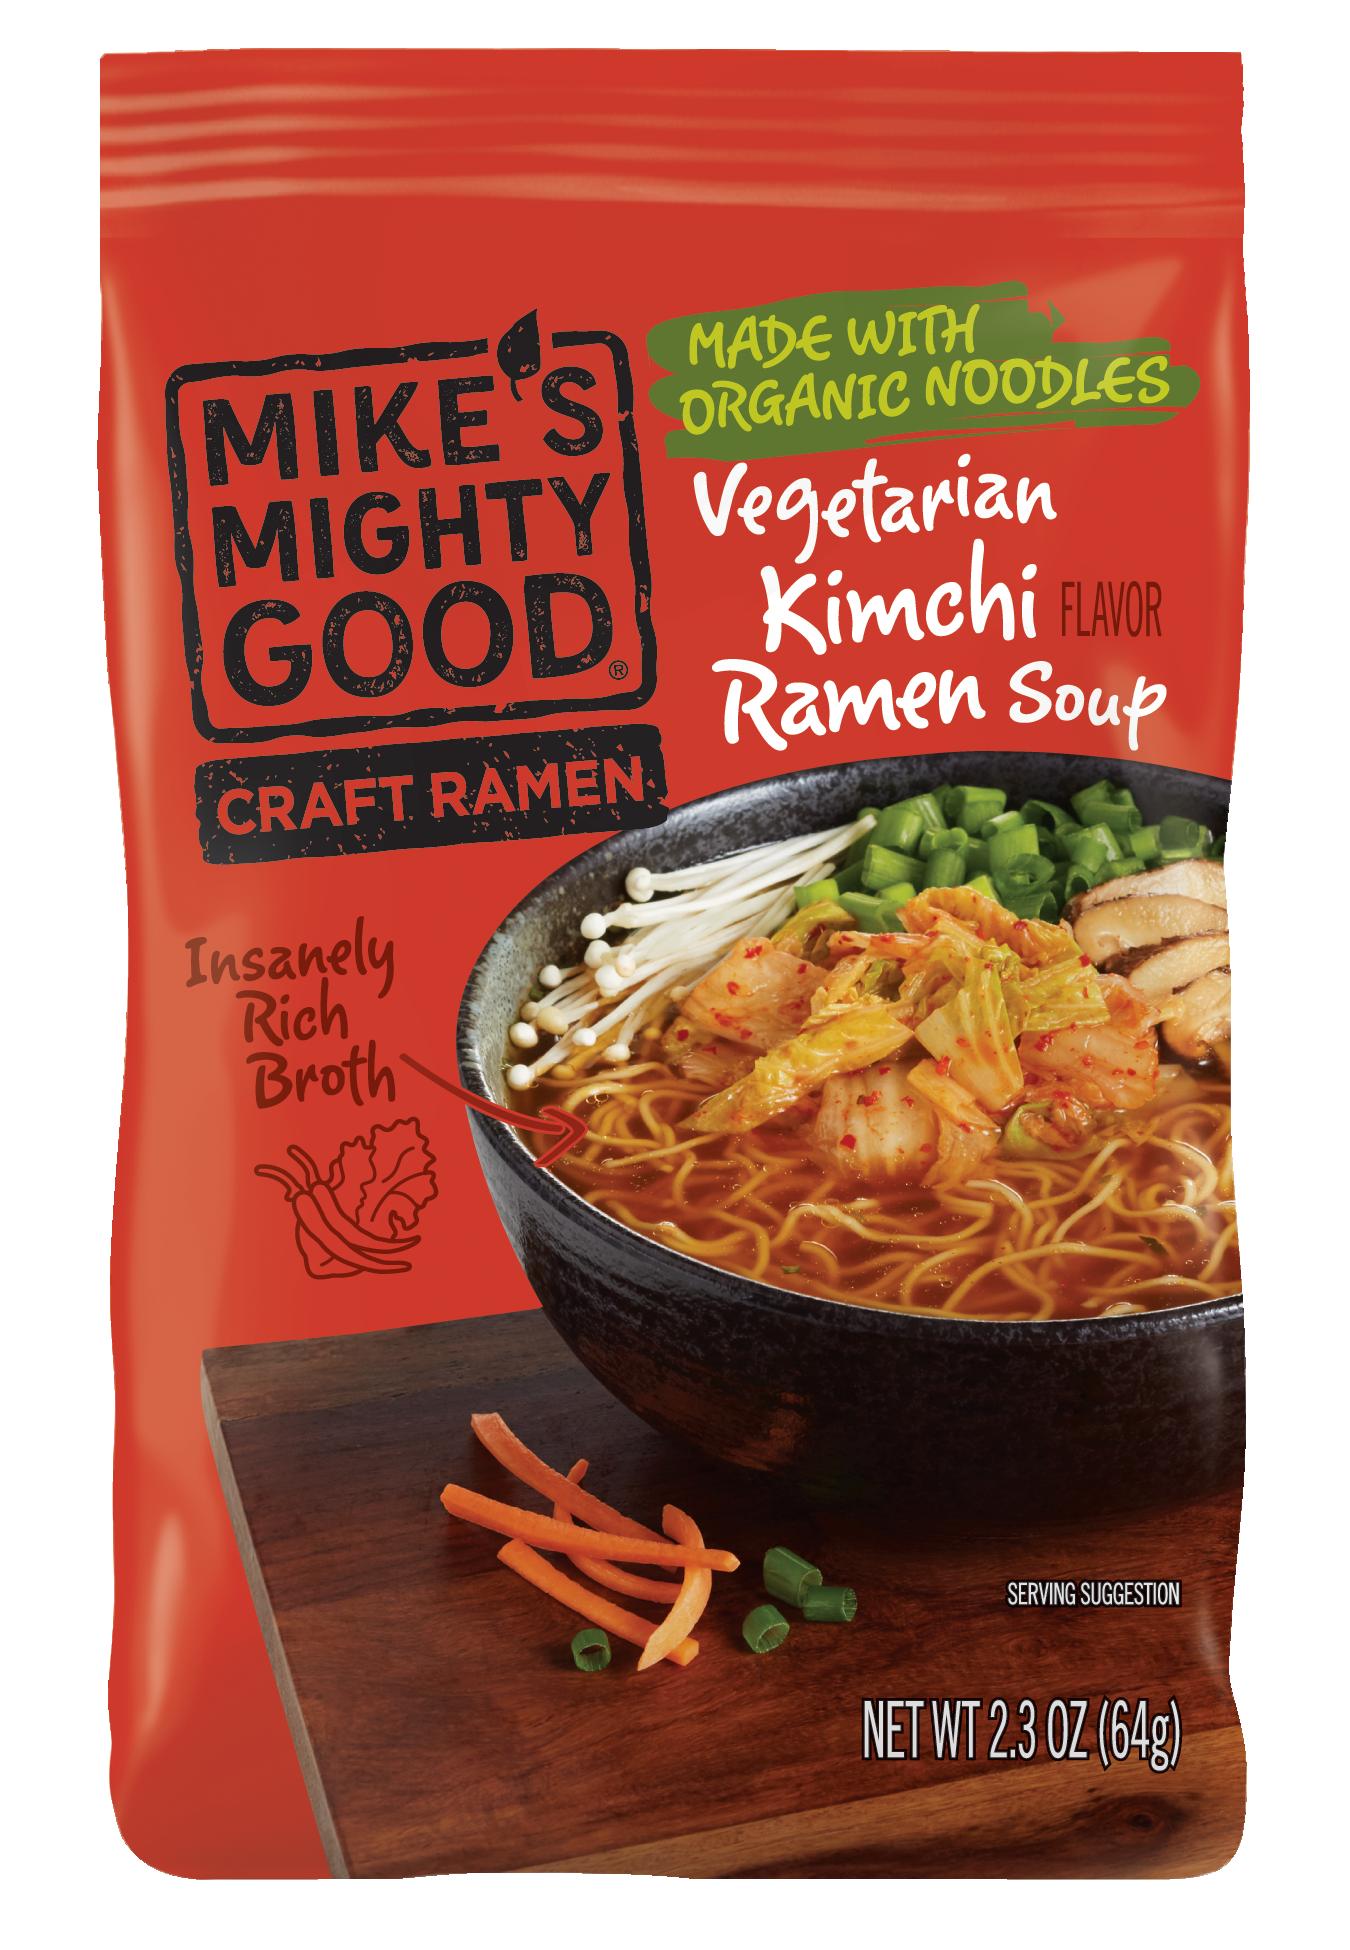 Vegetarian Kimchi Ramen Noodle Pillow Pack Vegetarian Kimchi Ramen Noodles Good Healthy Recipes